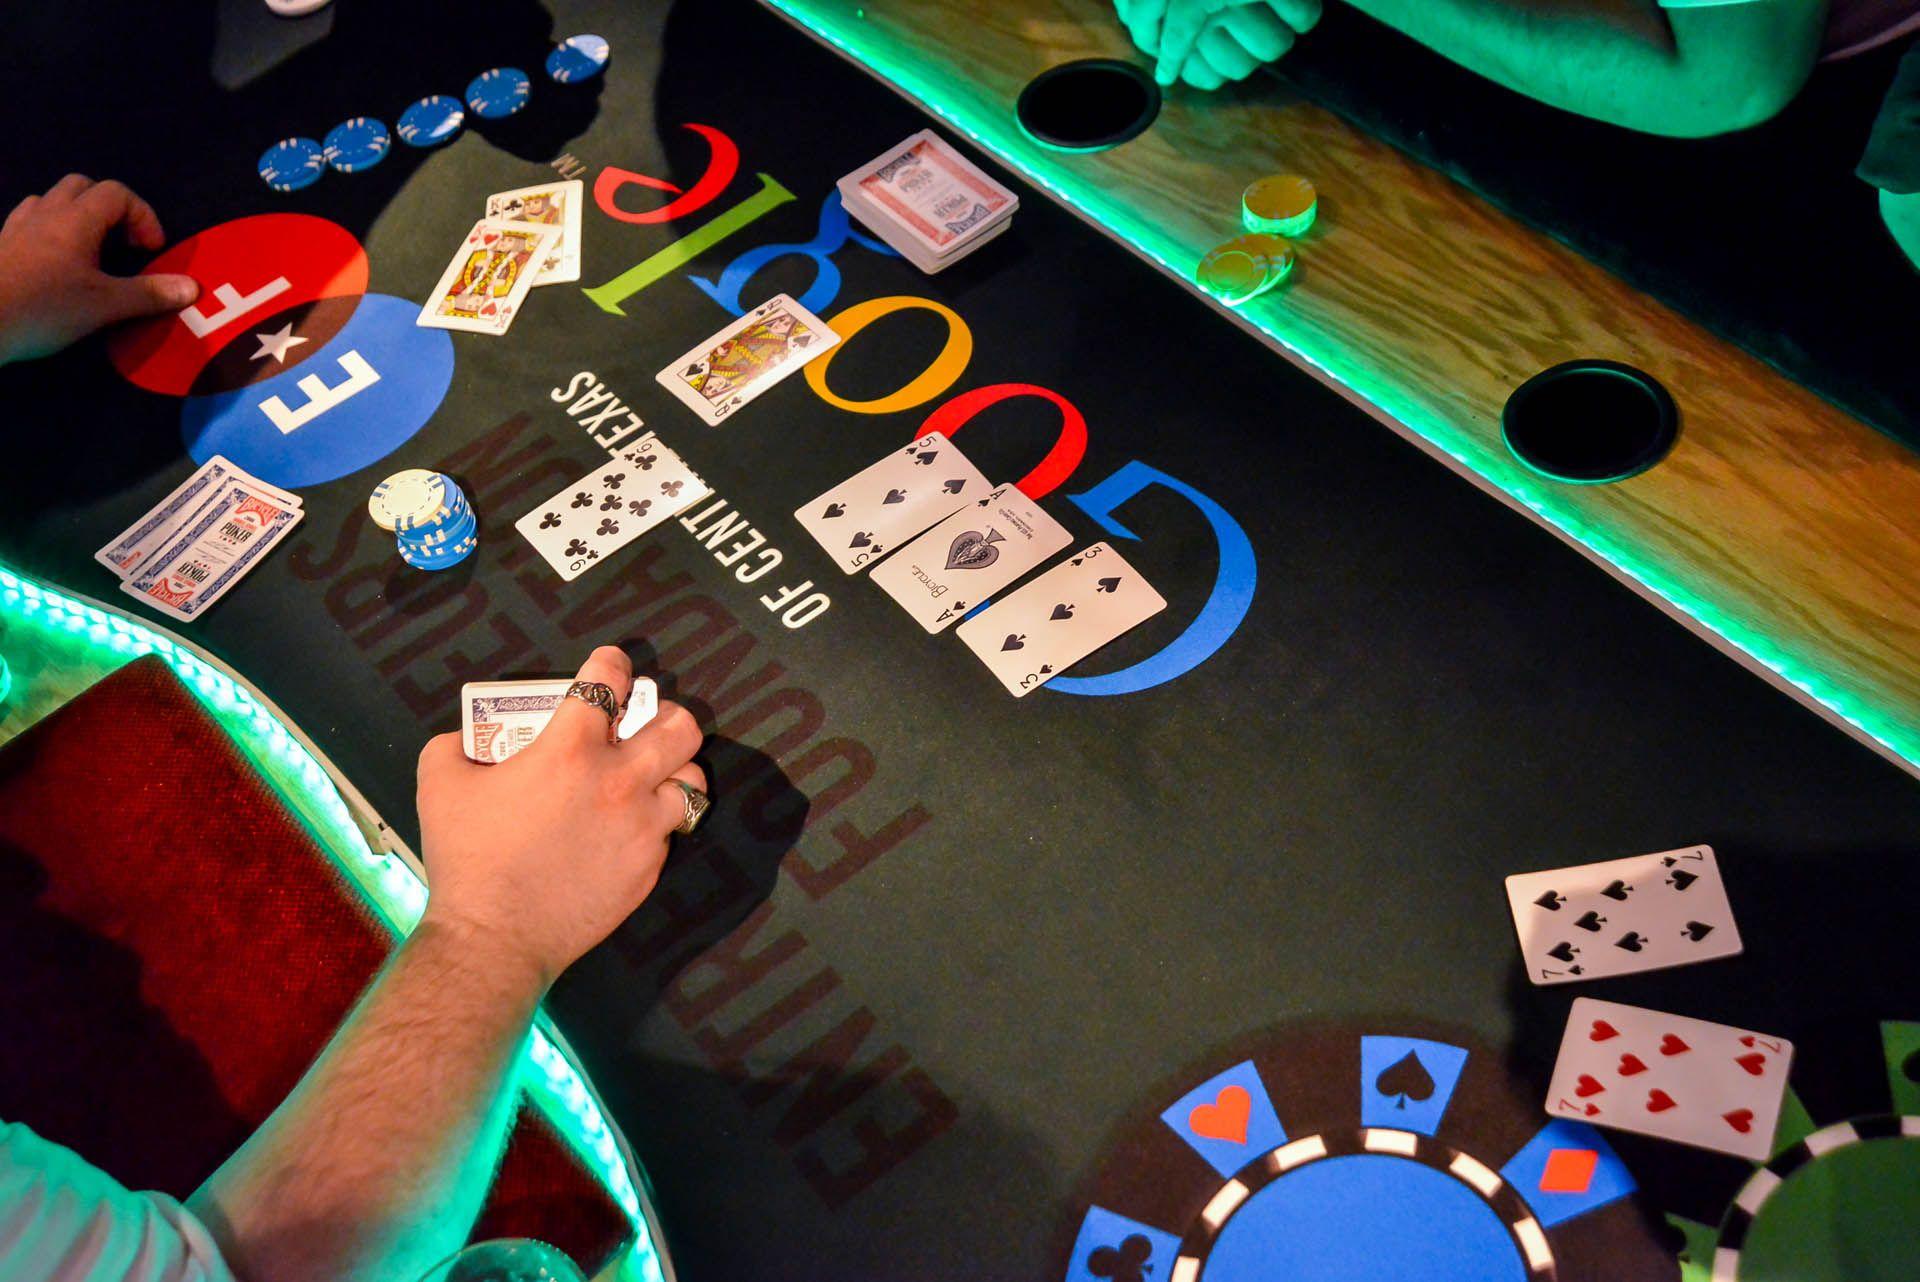 12th Annual Texas Hold'Em Poker Tournament